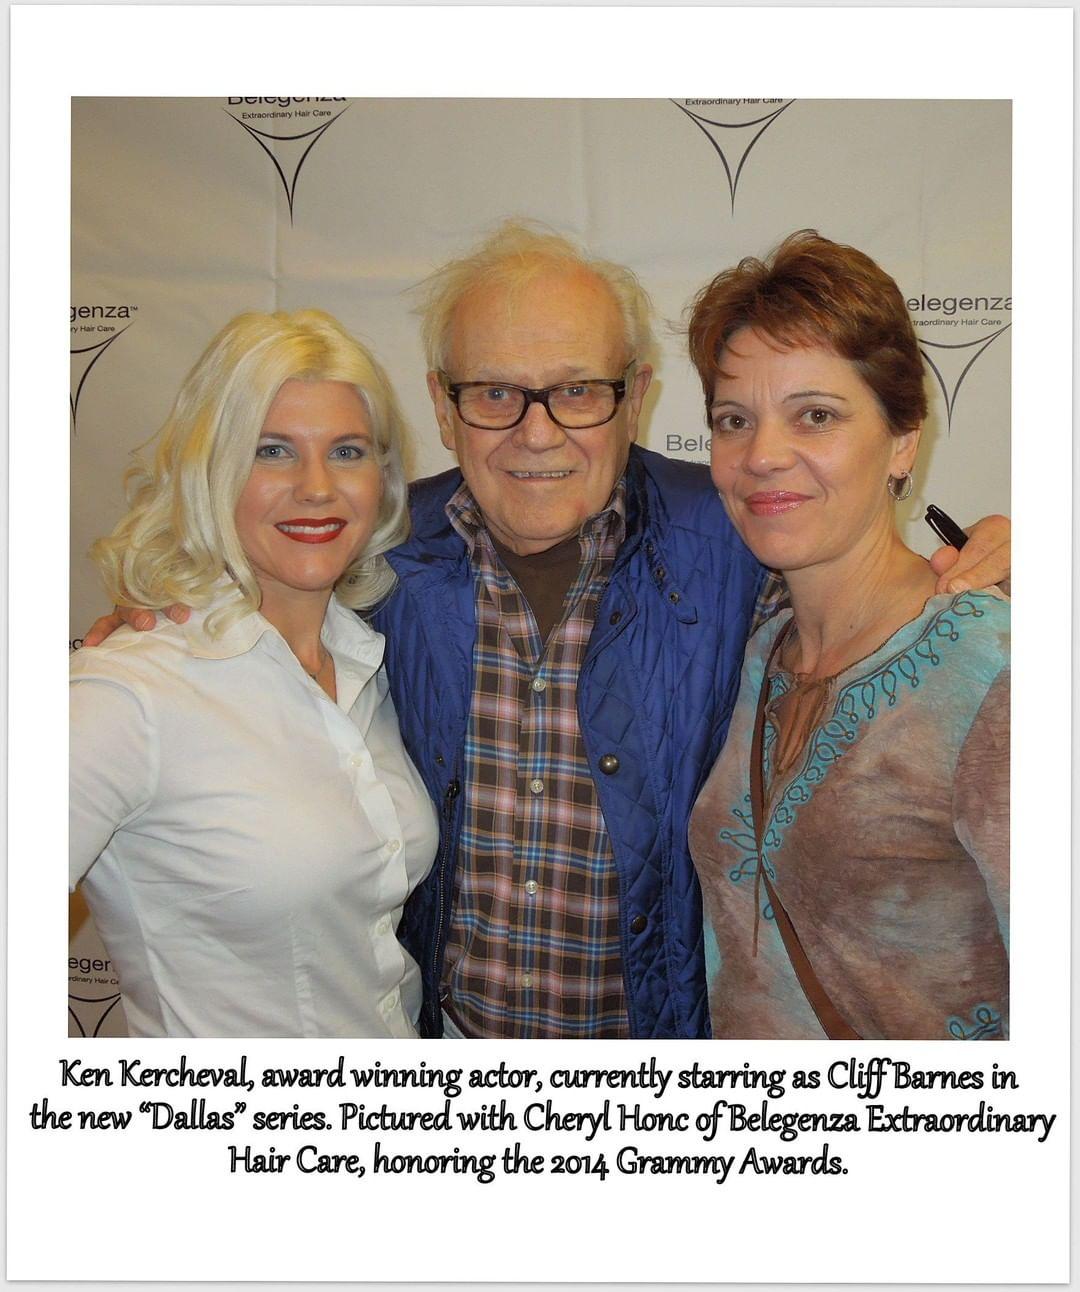 Ken Kercheval, acteur primé, sur la photo avec Cheryl Honc de Beleganza Extraordinary Hair Care, durant les Grammy Awards de 2014. | Webstagram/@belegenza